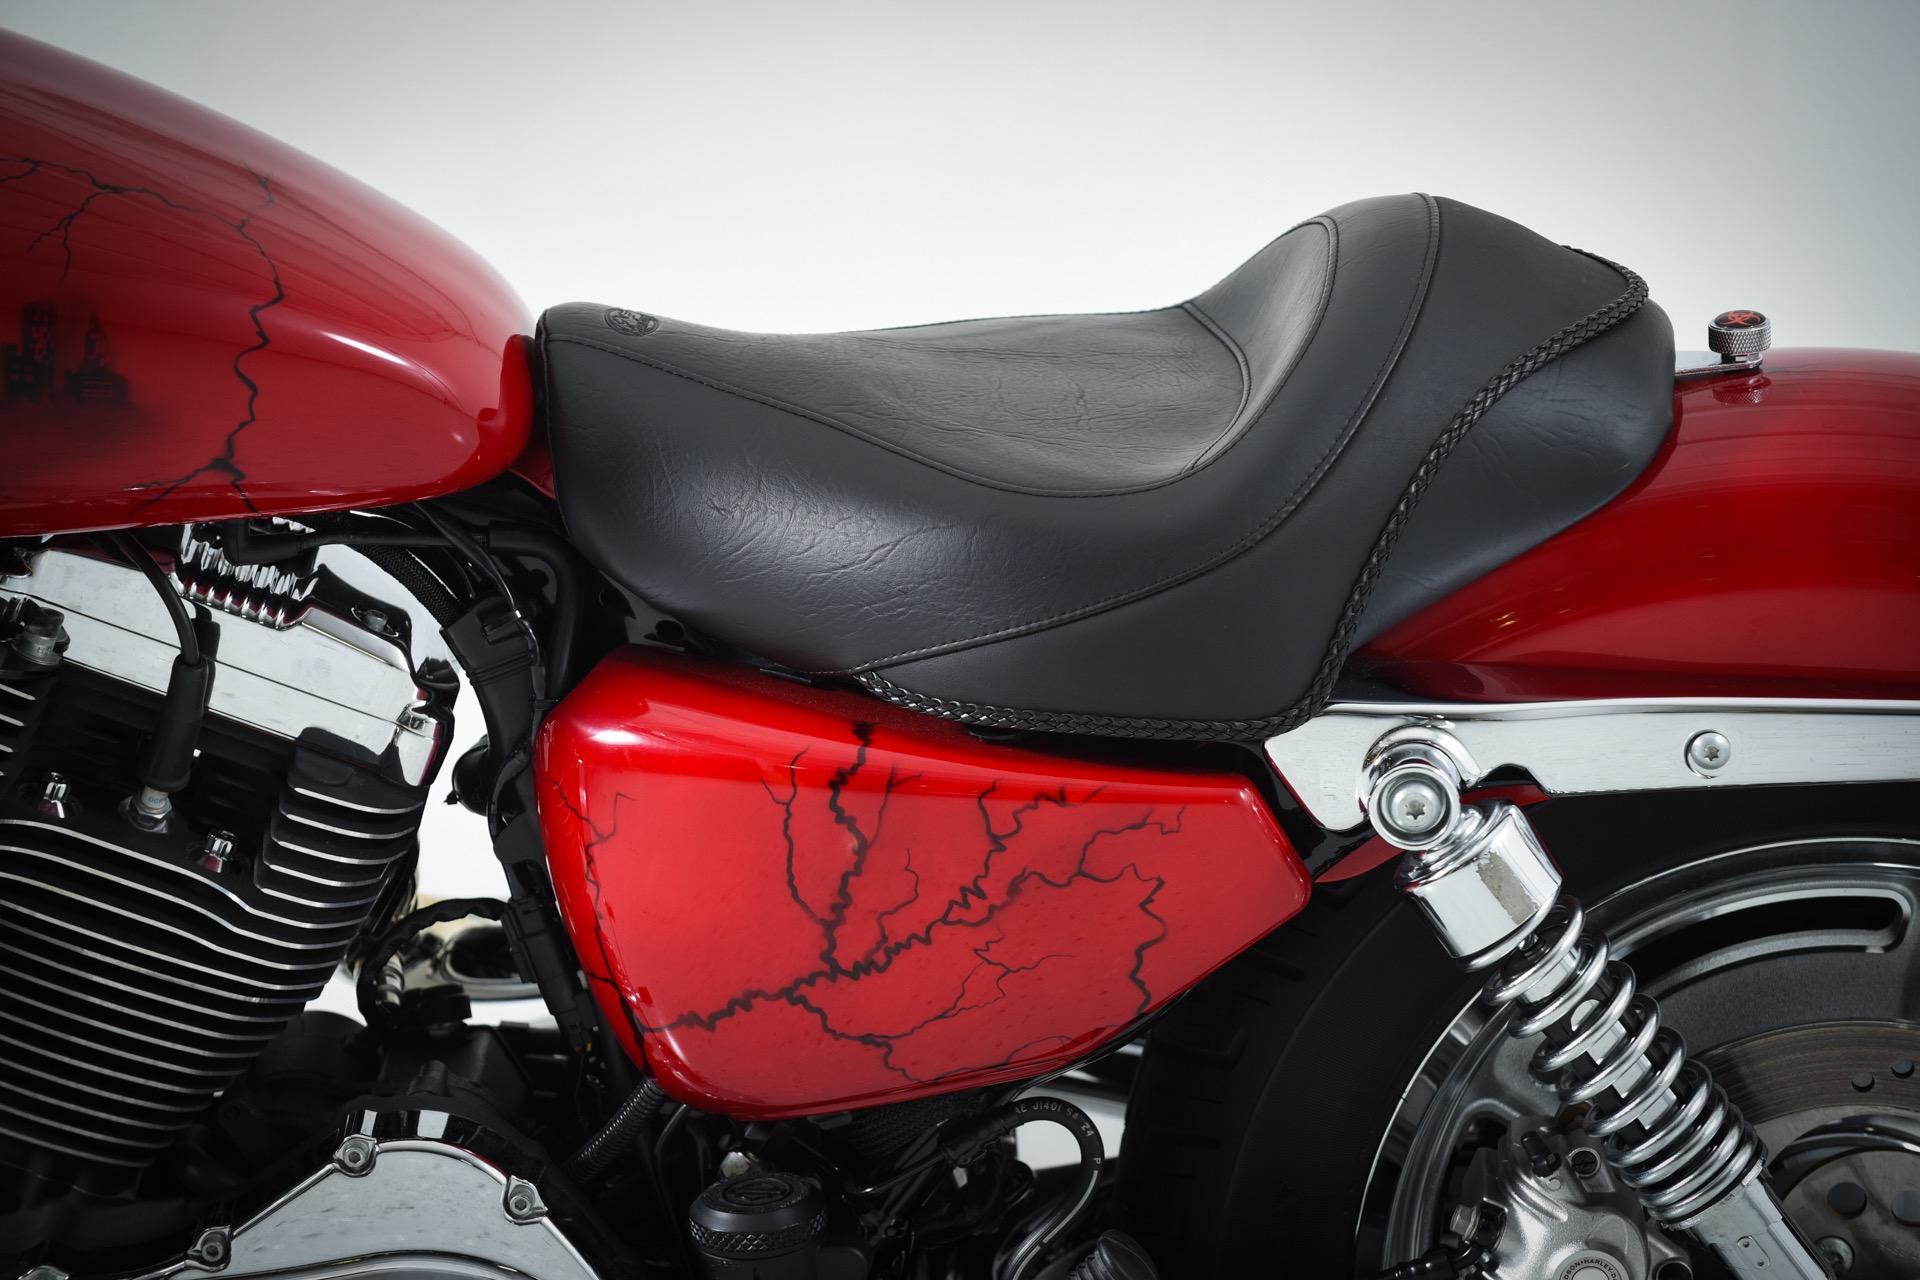 2009 Harley-Davidson 1200 Sportster